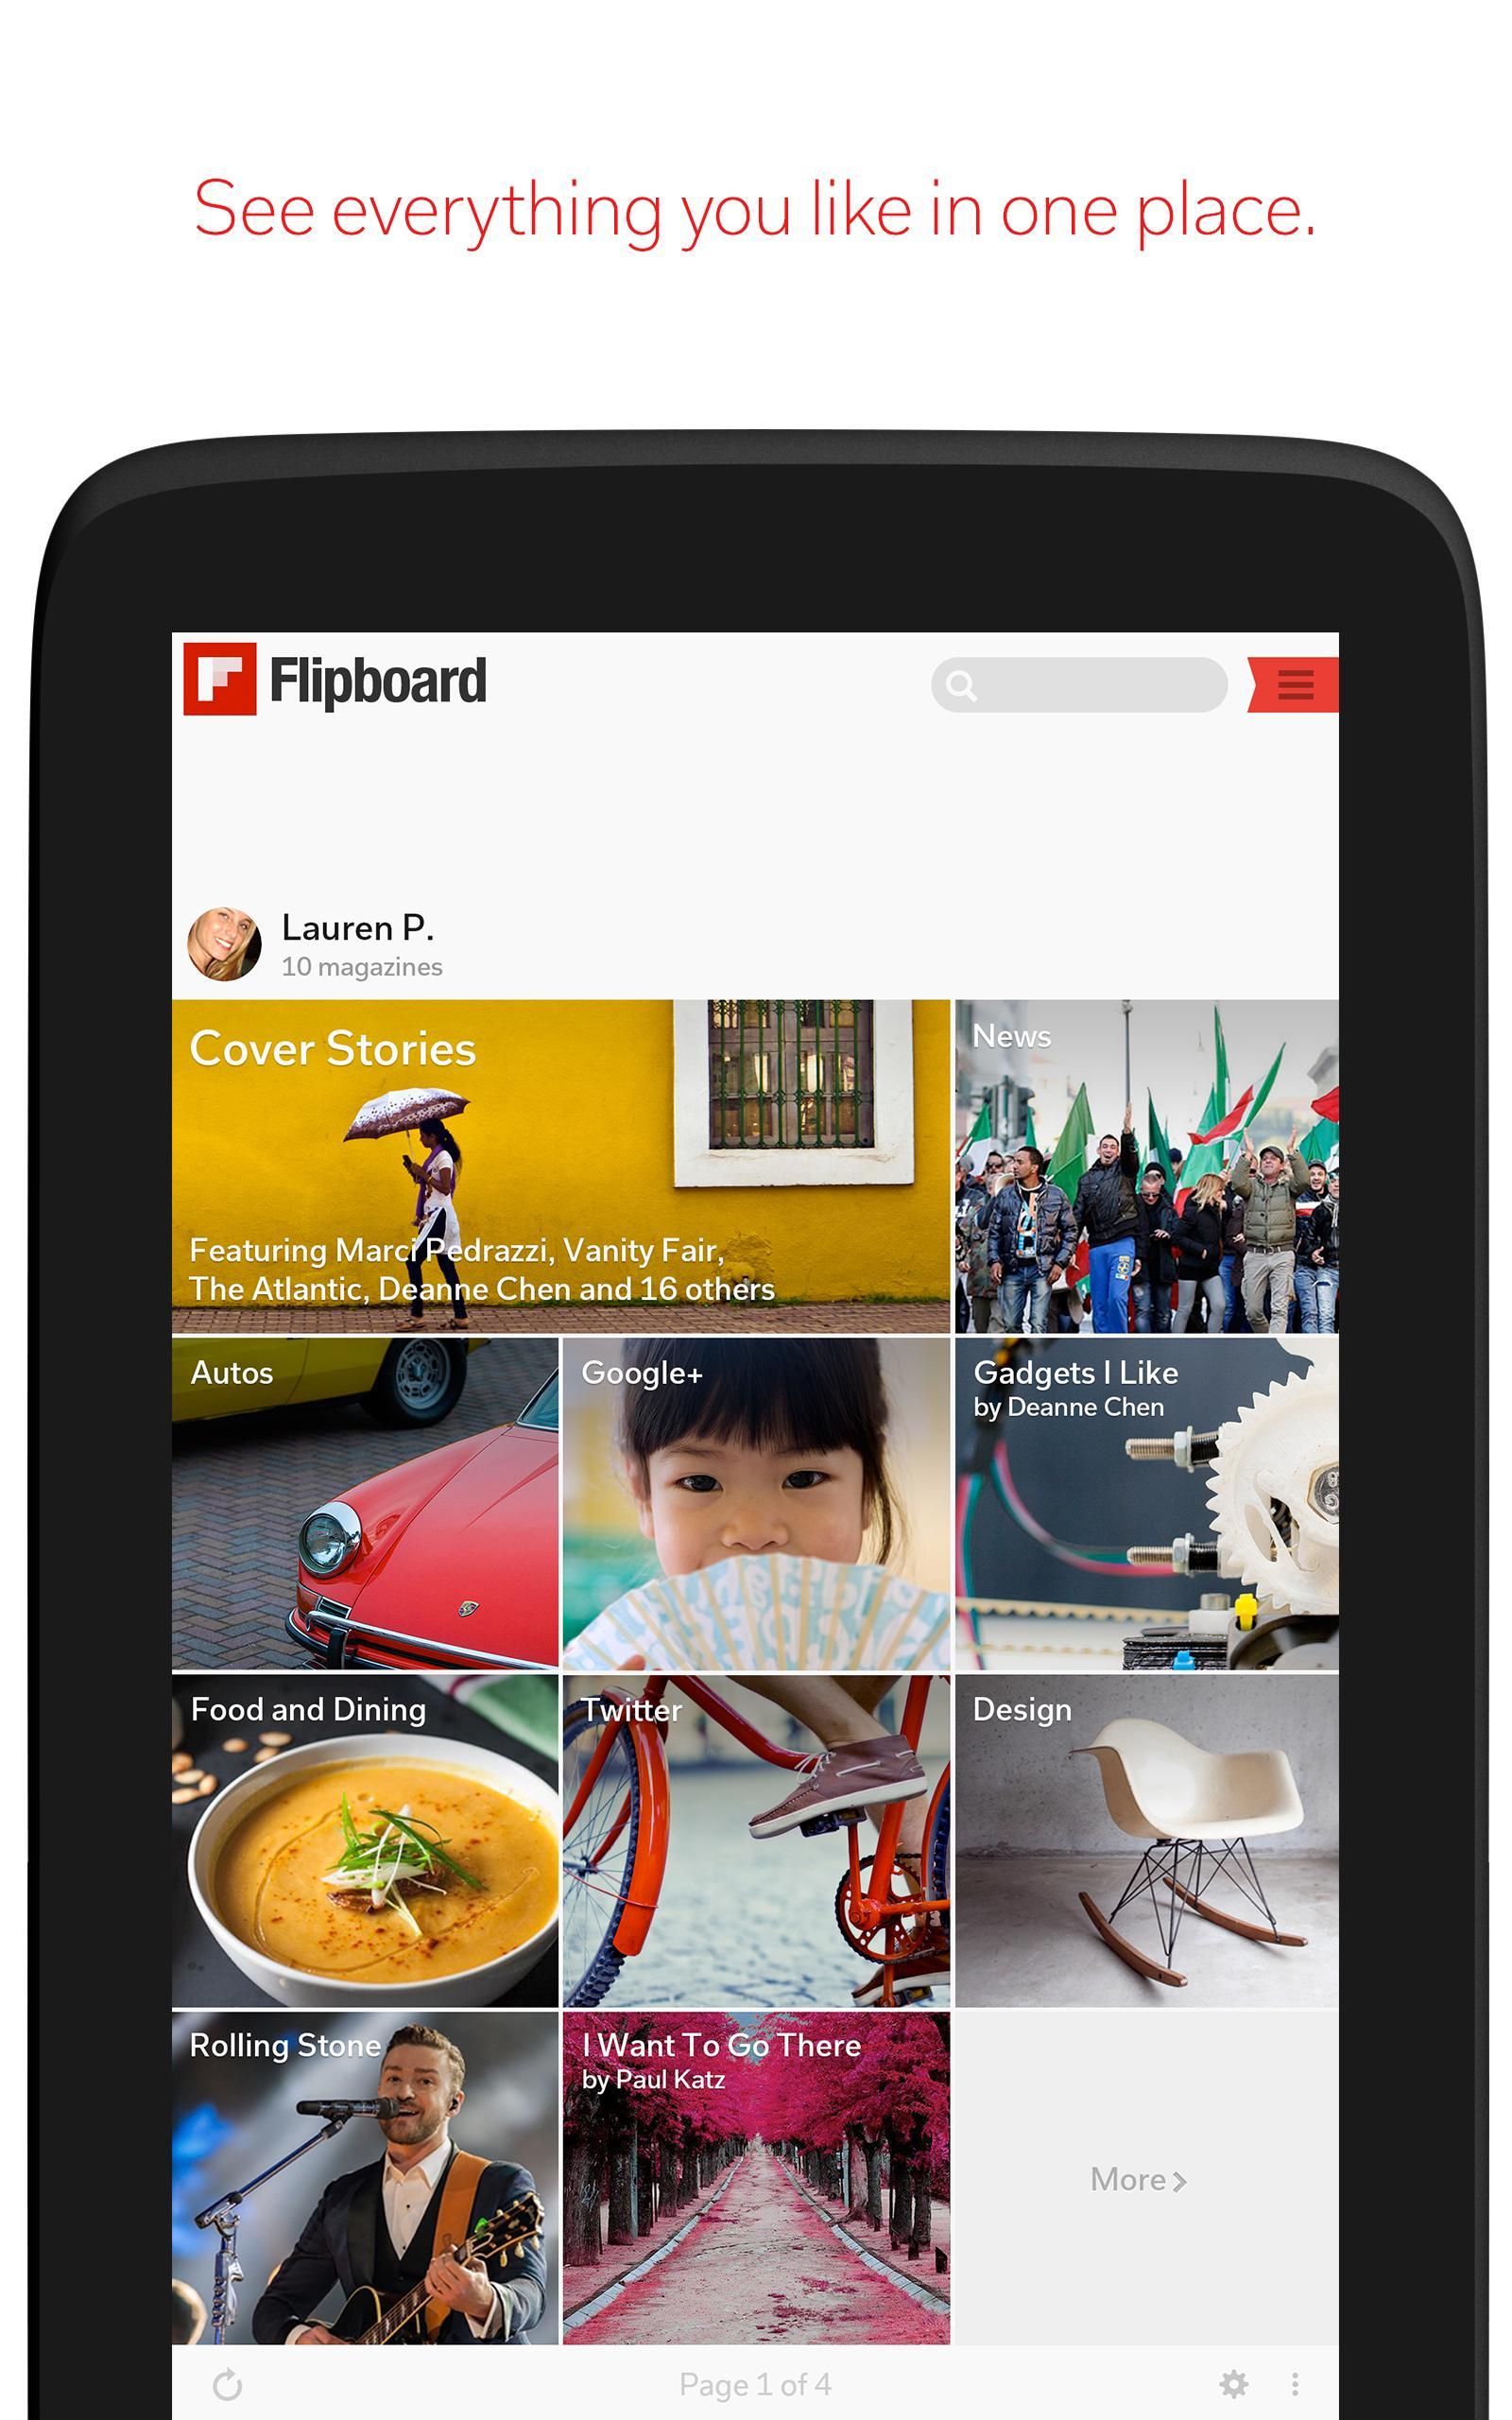 Flipboard Latest News, Top Stories & Lifestyle 4.2.59 Screenshot 7